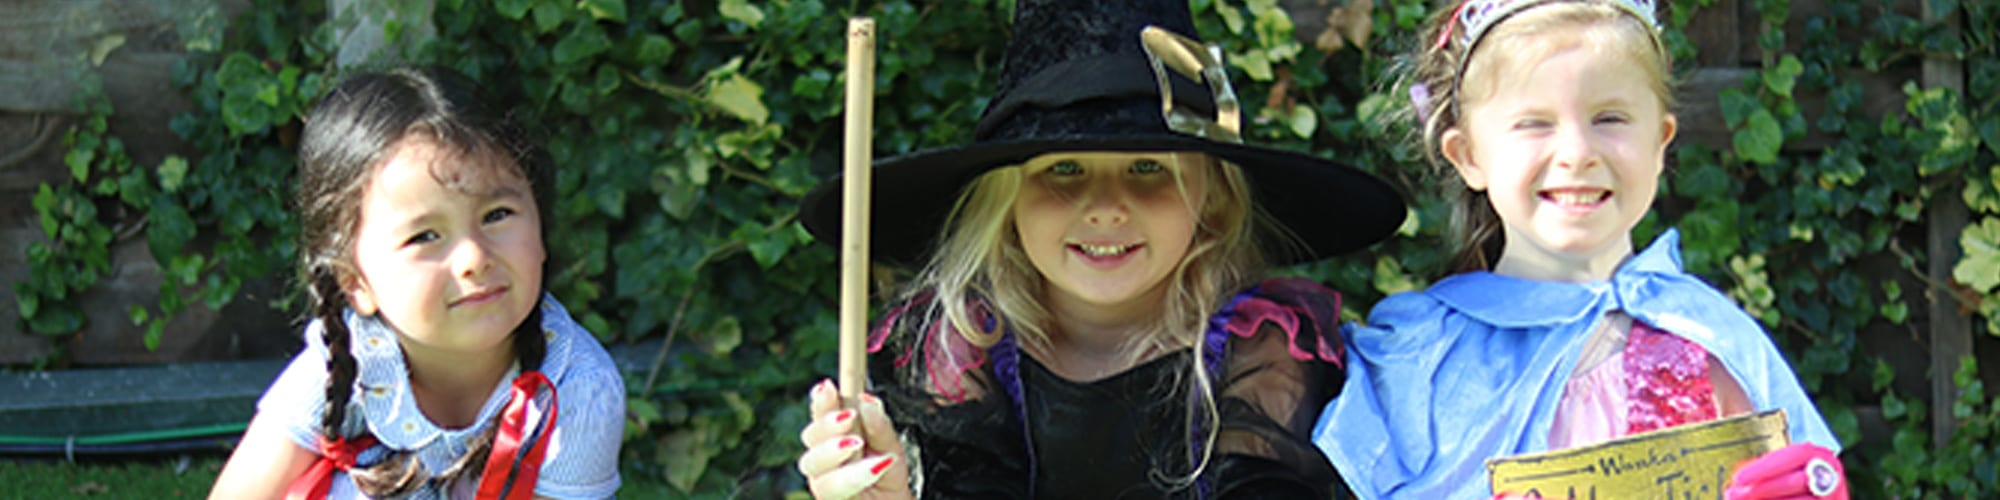 Early Years Image Gallery Hollygirt School